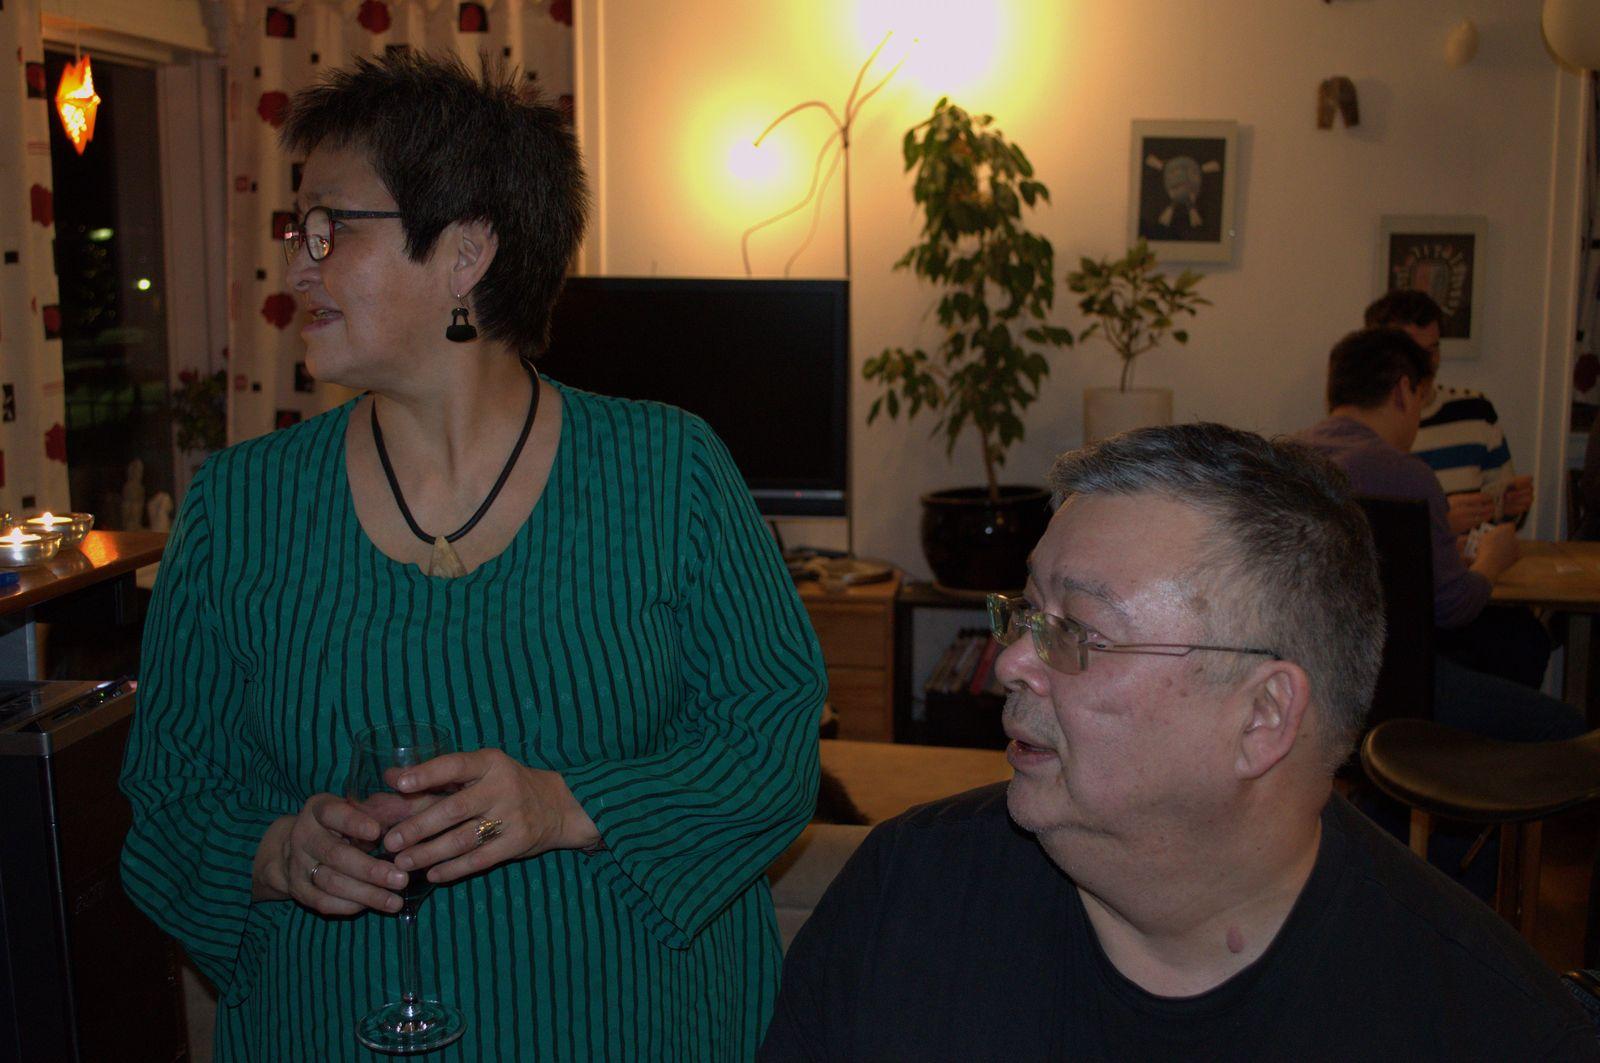 2013-12-27-2040_-_jakobine_labansen_simon_moqqu_loevstroem